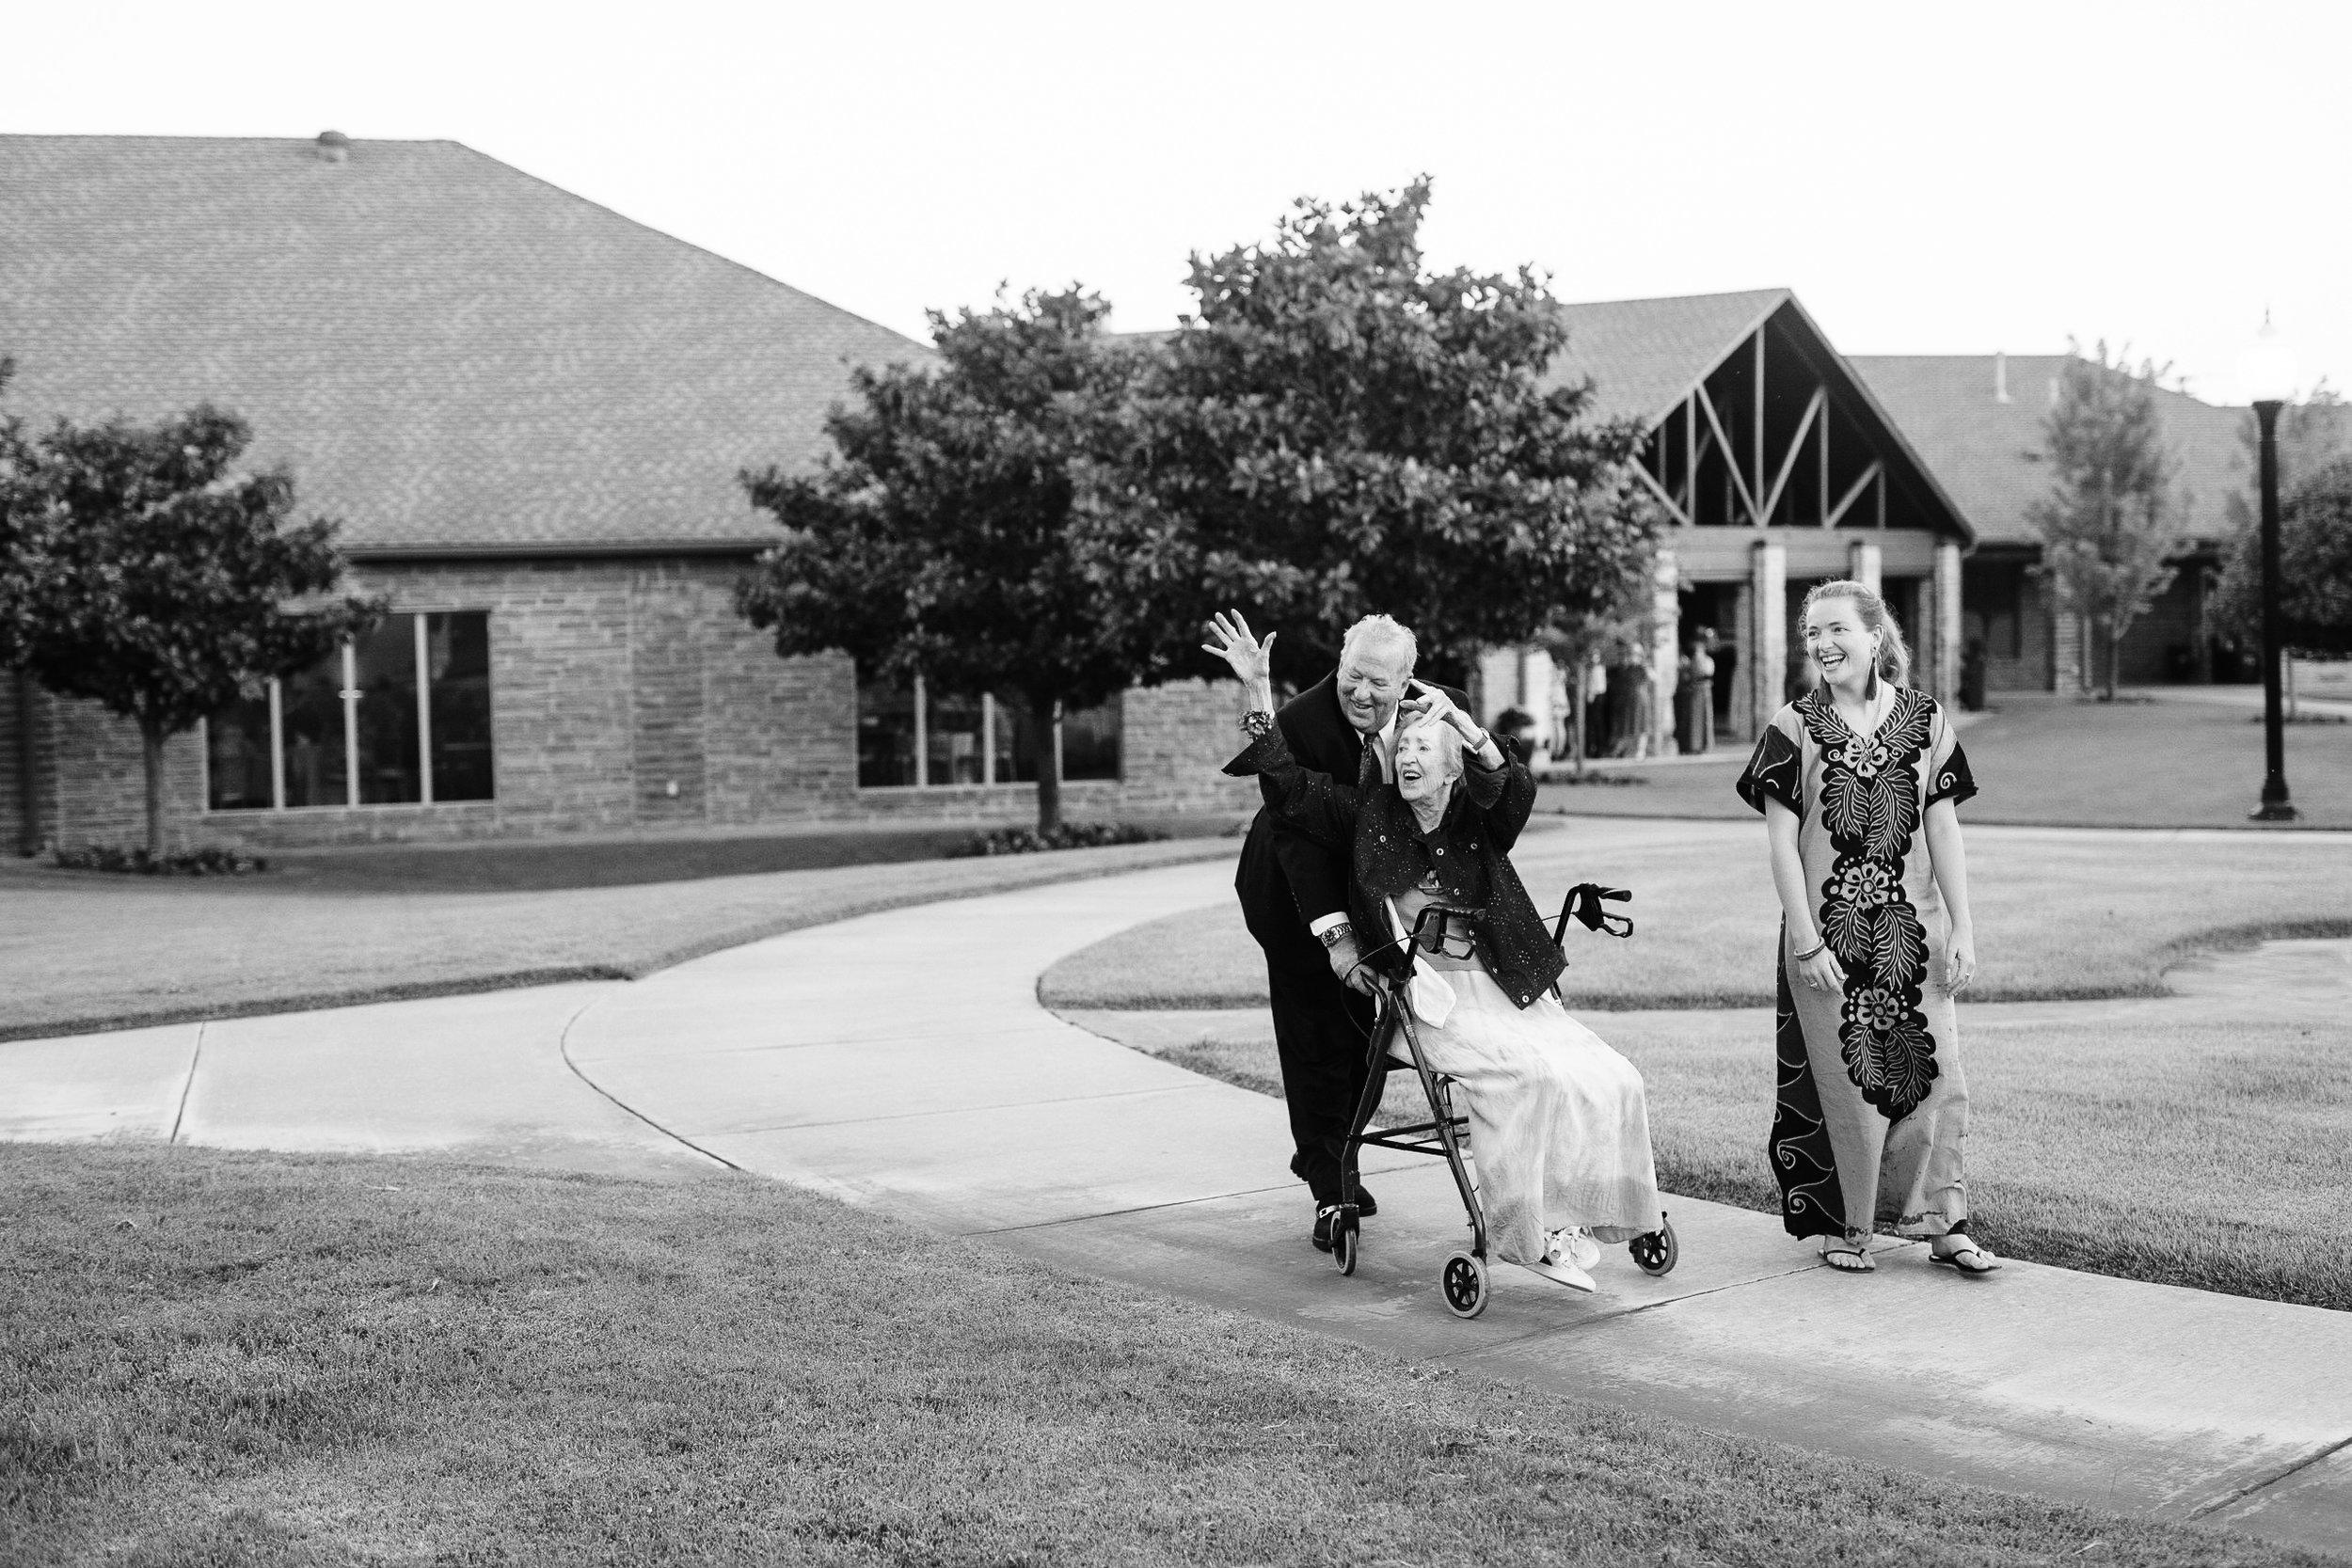 okc-wedding-photographer-coles-garden-wedding-okc-best-wedding-photographers-151.jpg